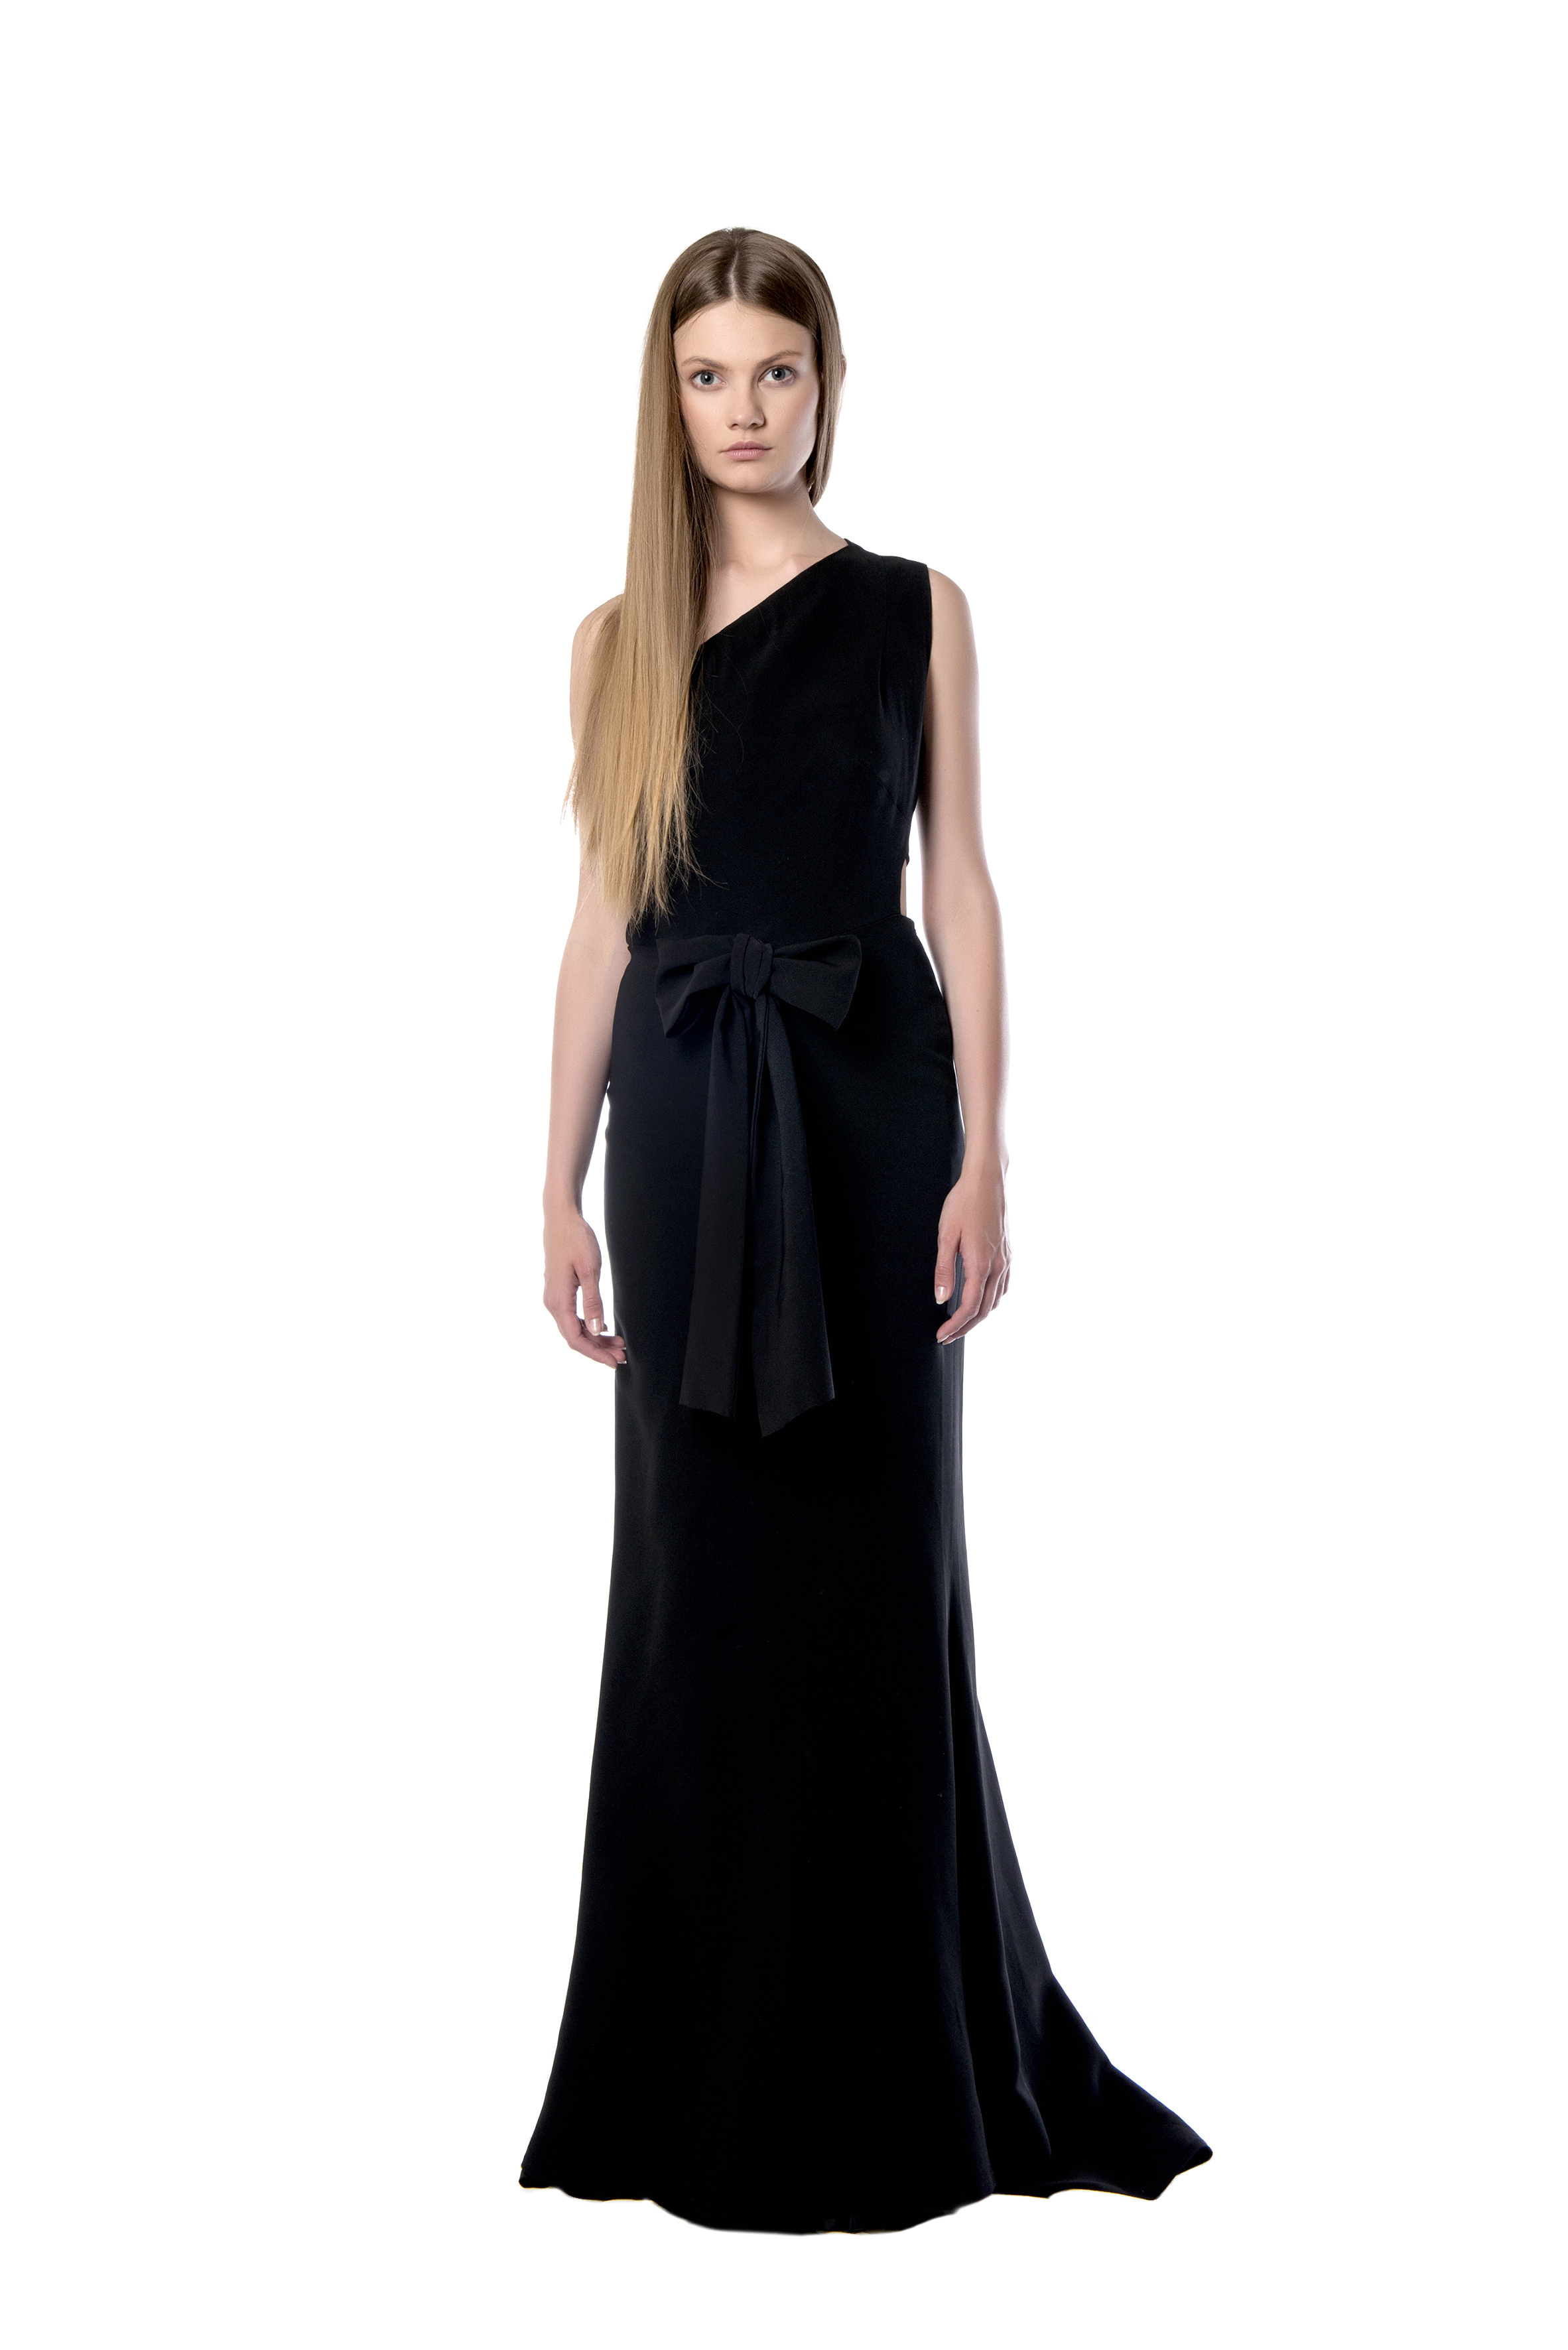 67d33c96cca Μακρύ φόρεμα με έναν ώμο - clothing - Products | Celia Kritharioti Eshop